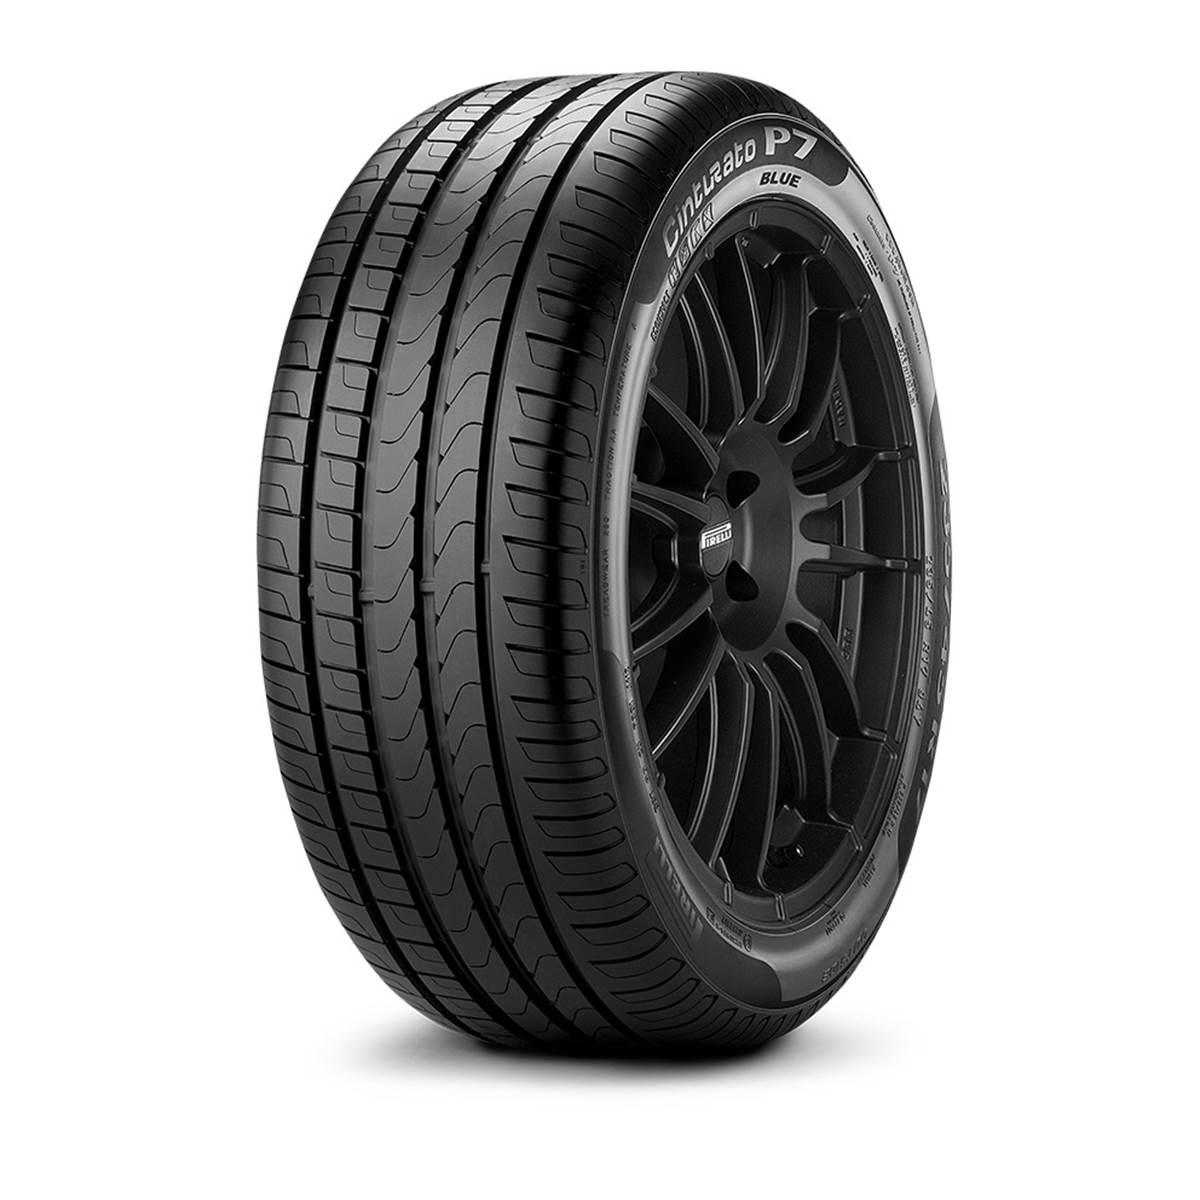 Pneu Pirelli 215/55R16 97W Cinturato P7 Blue XL